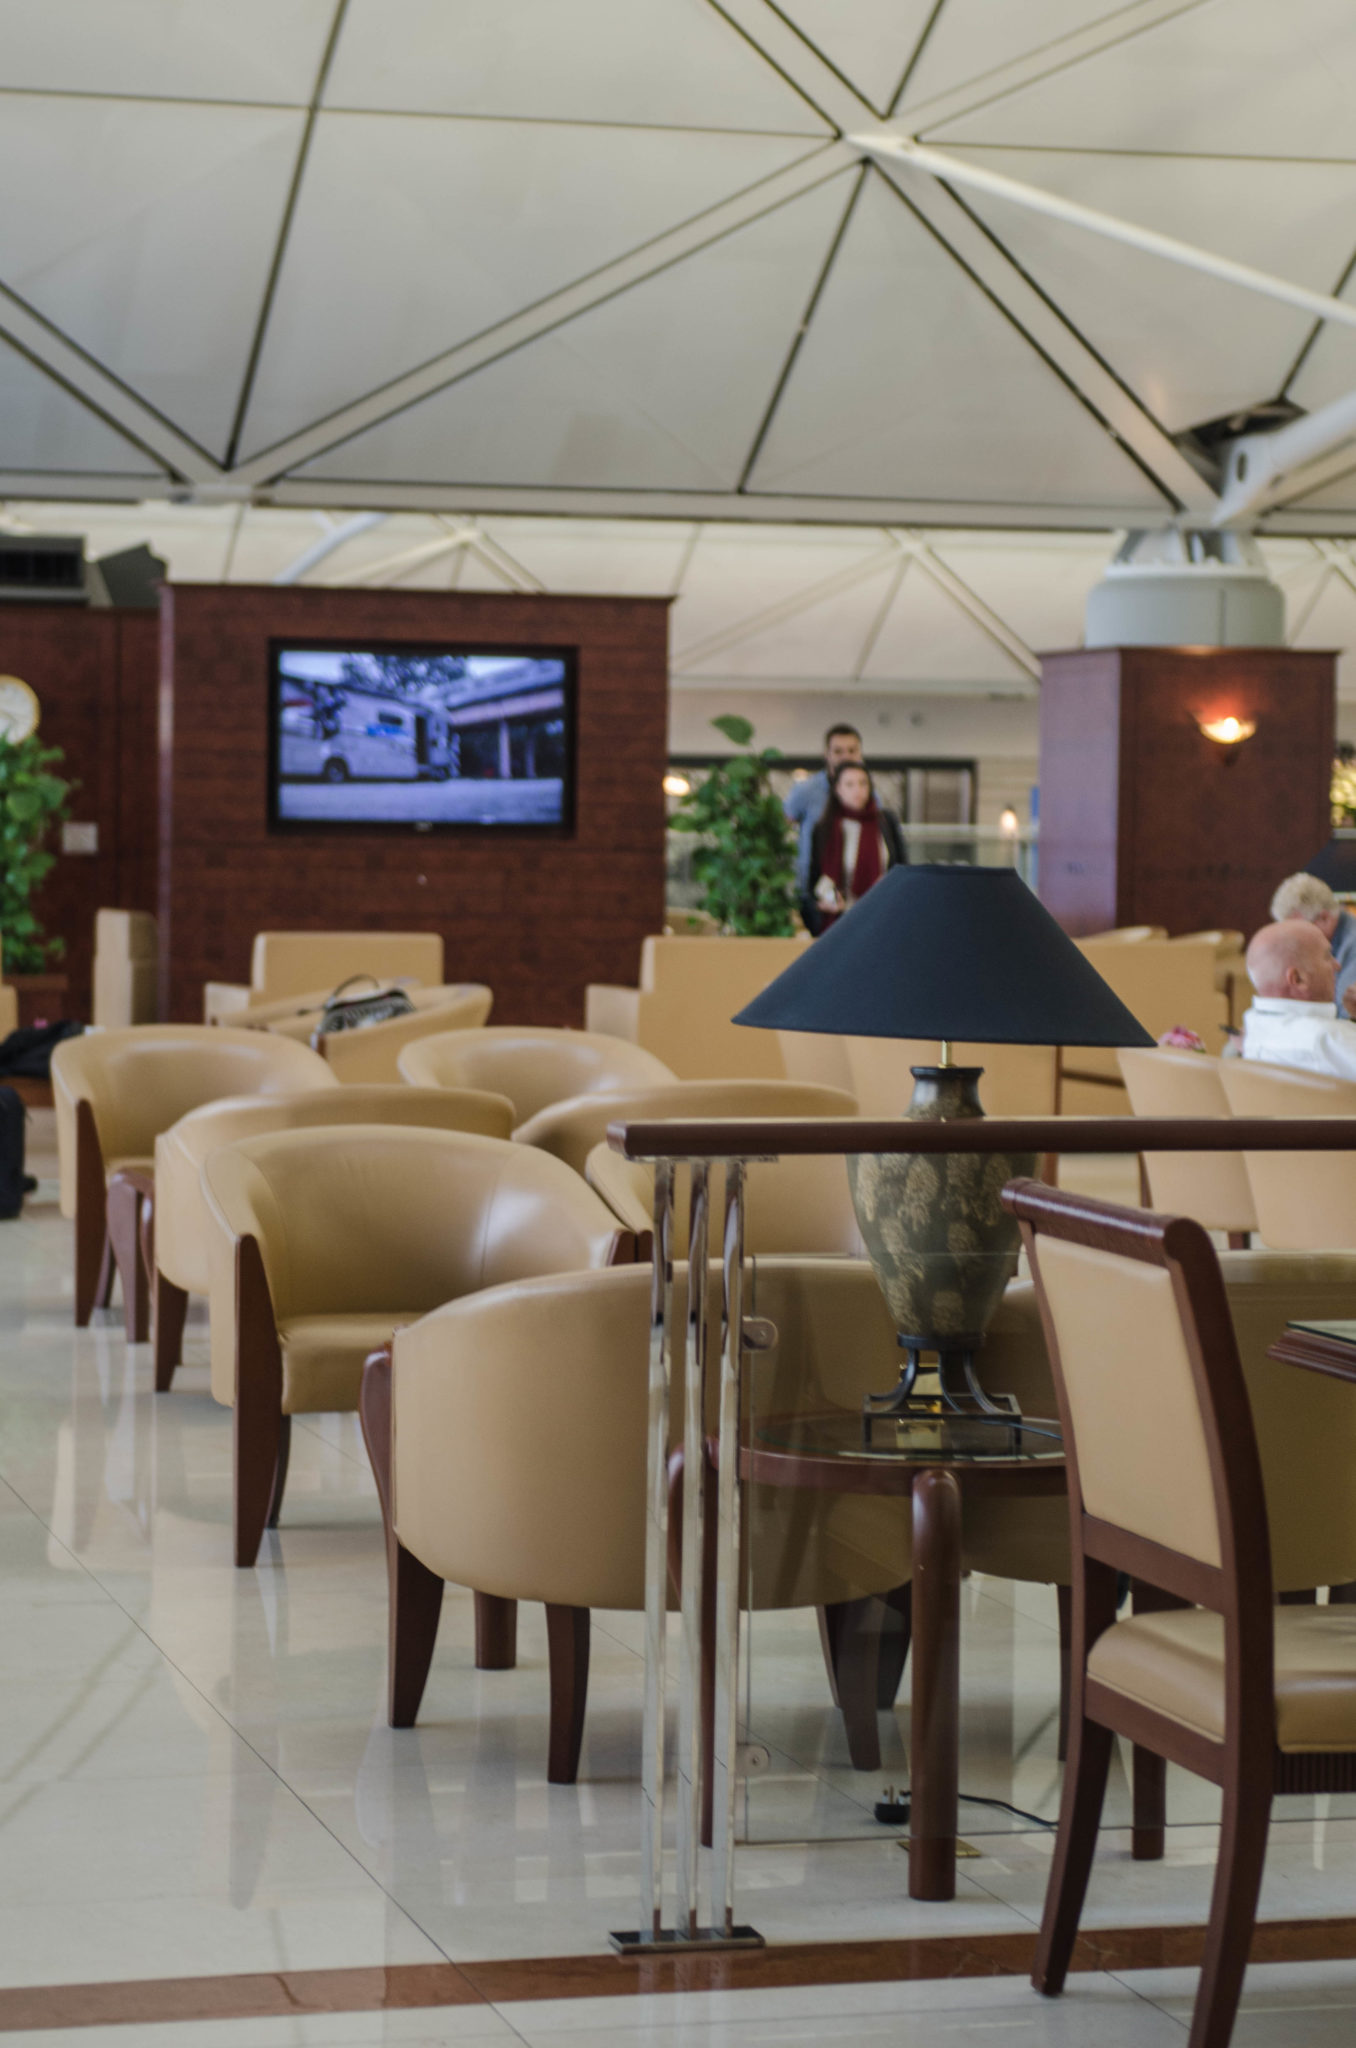 Die Emirates Business Class Lounge am Hongkong Airport ist groß und hell.